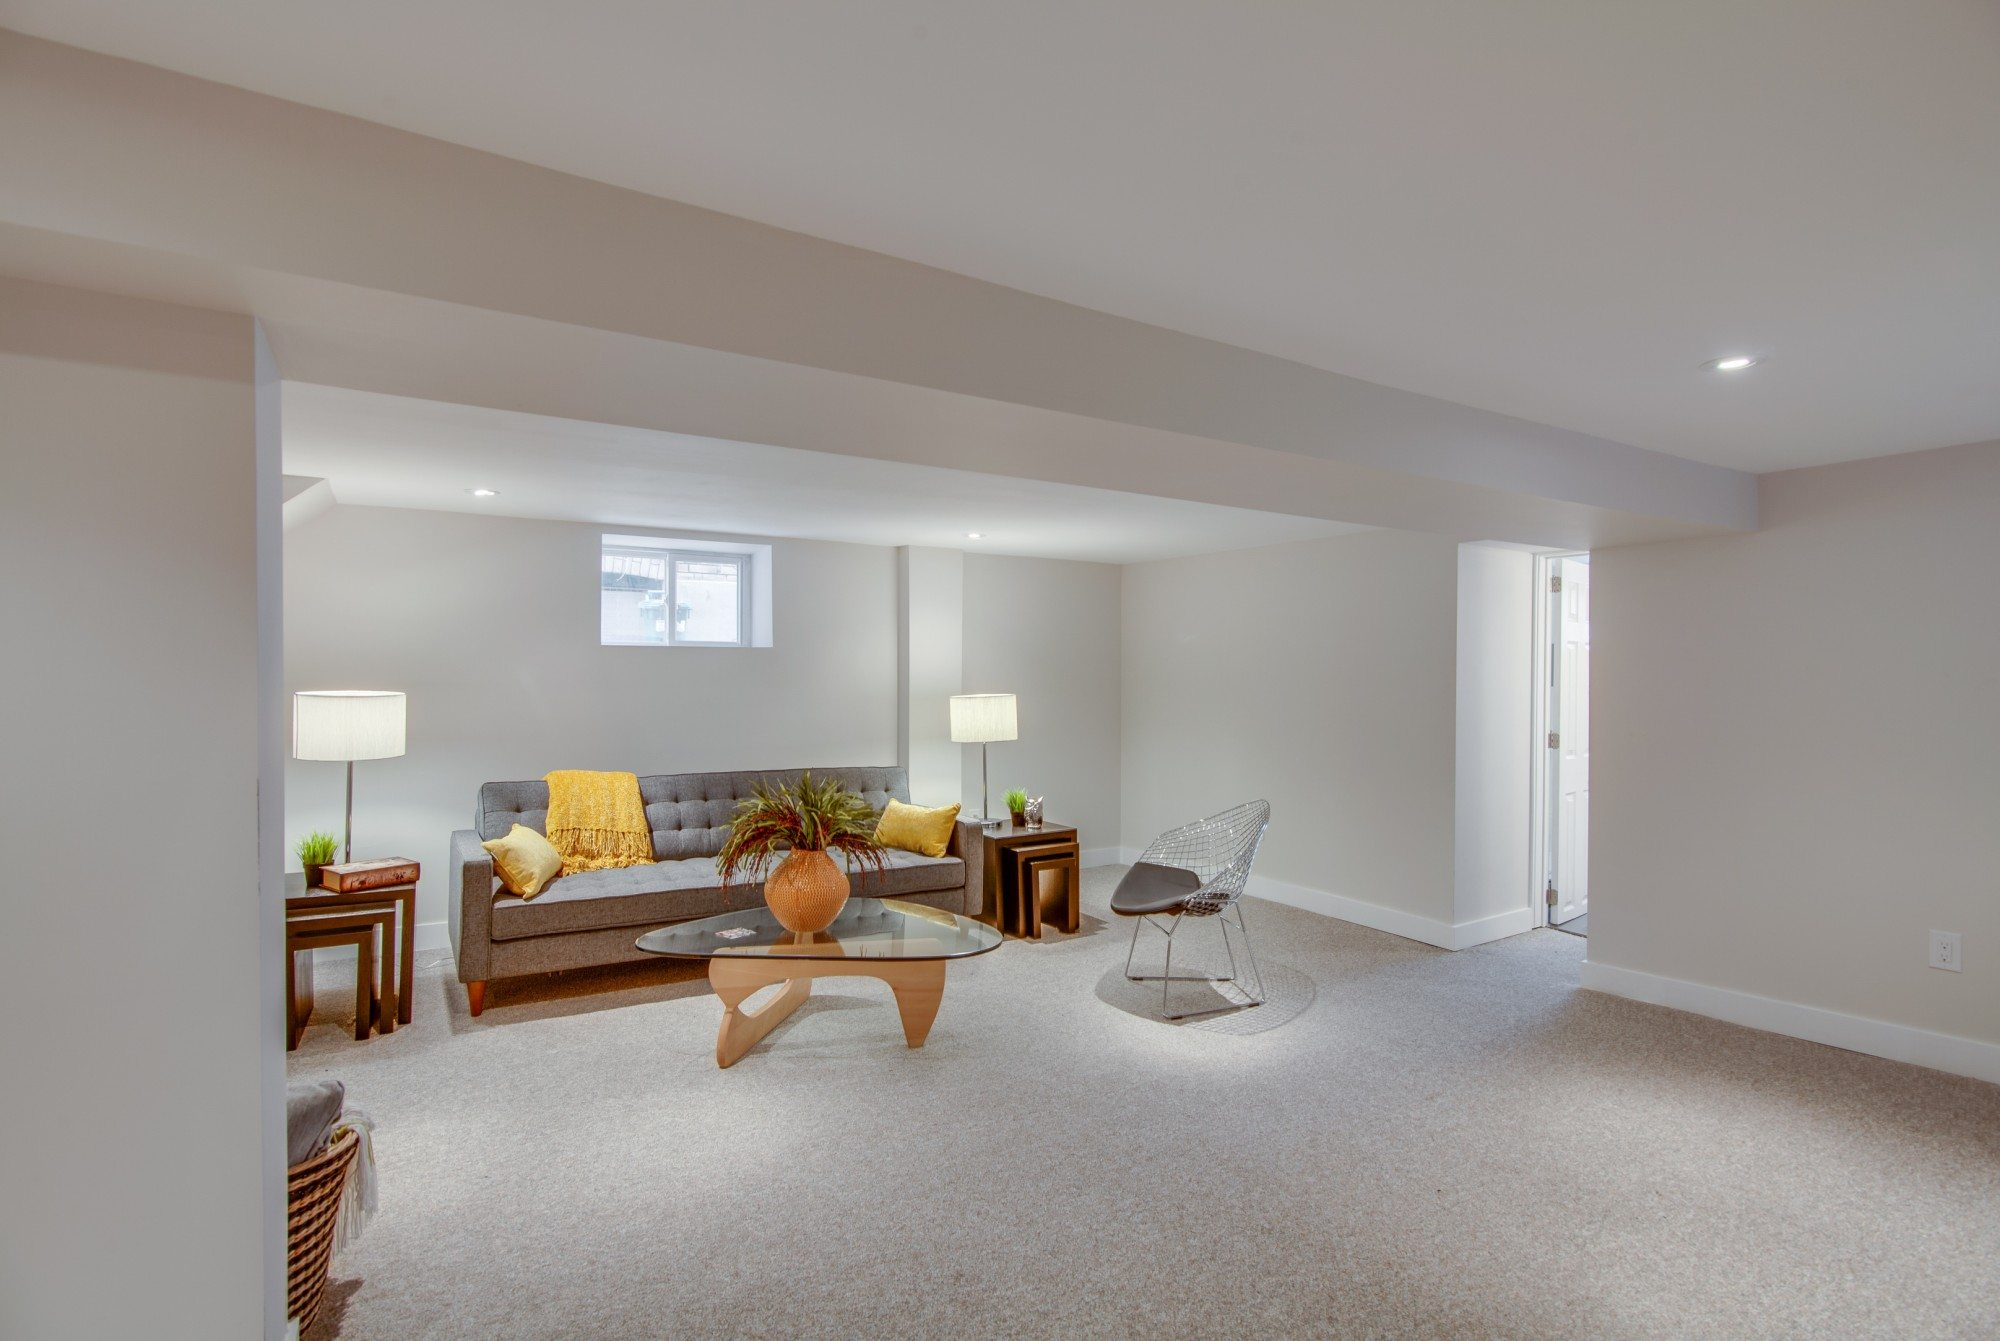 toronto-house-for-sale-309-sunnyside-avenue-15